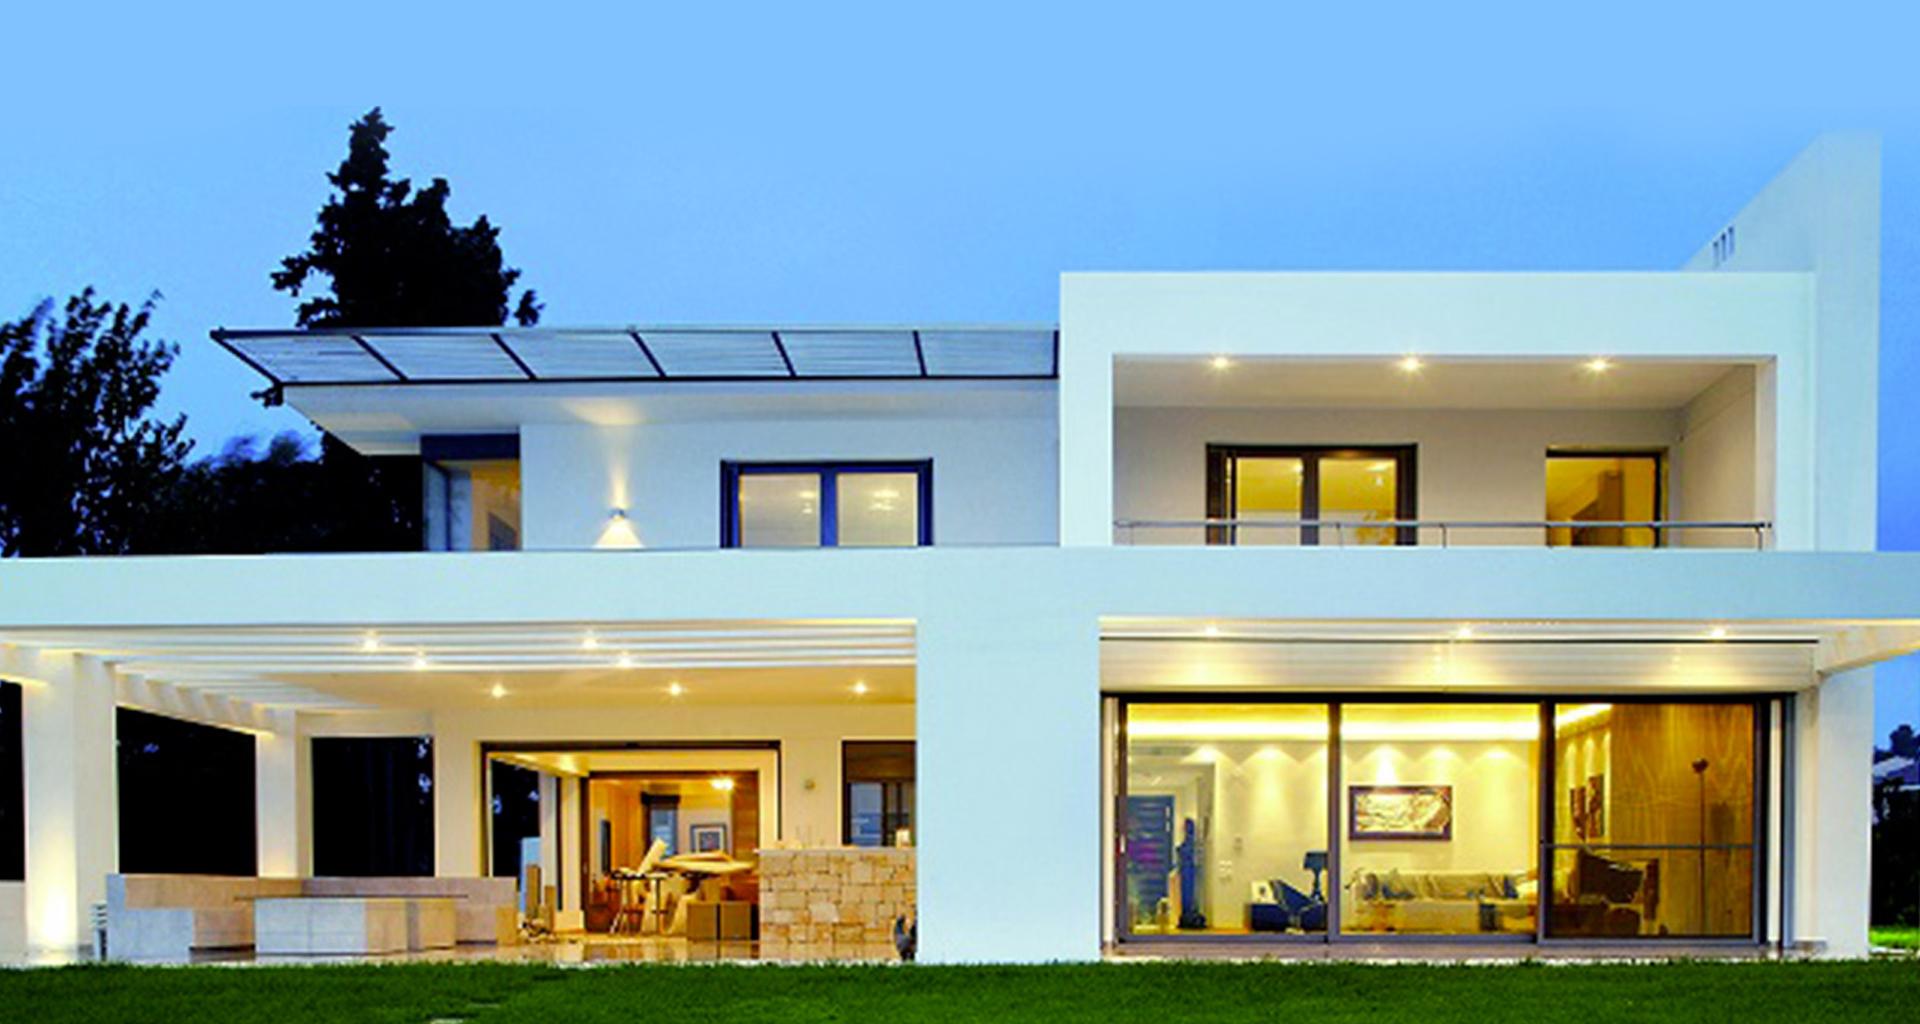 7 janelas, idaluminios, janelas em pvc, caixilharias em pvc, janelas de pvc